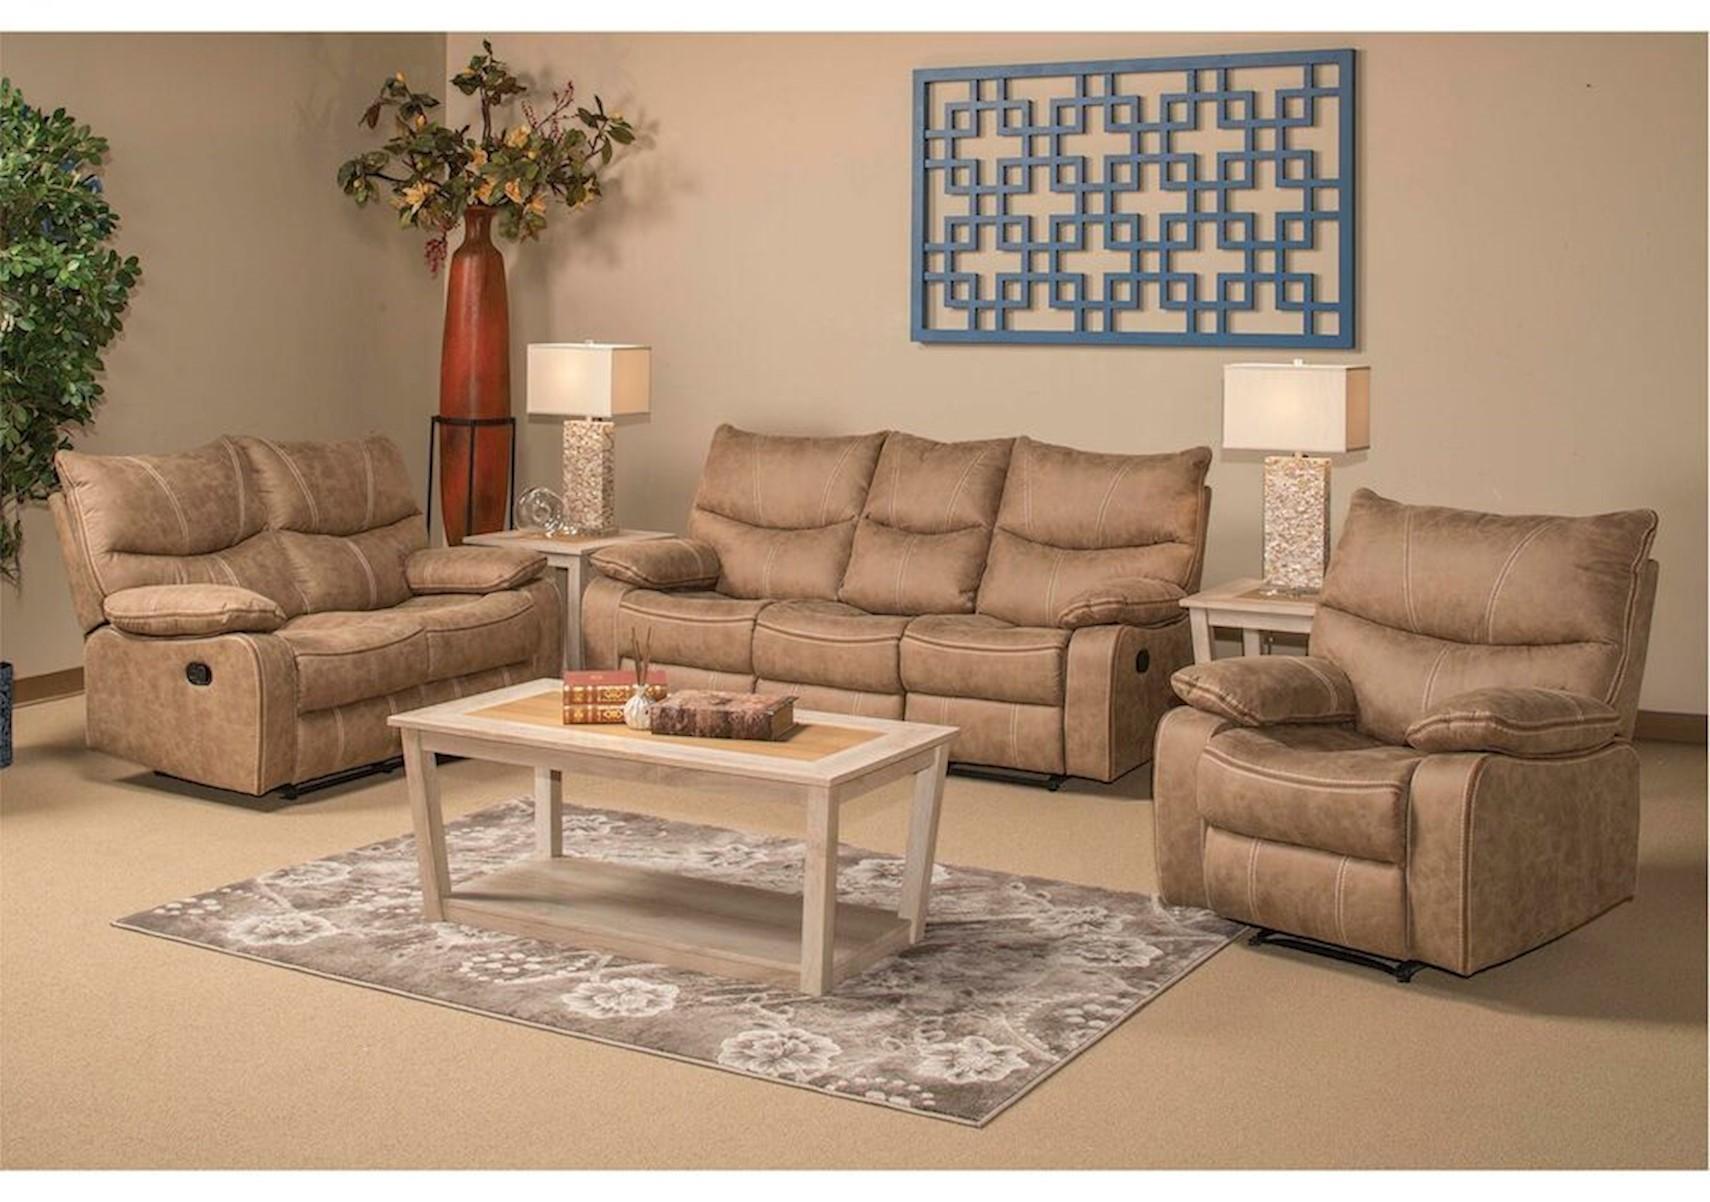 Lacks  Peyton 4-Pc Reclining Living Room Set